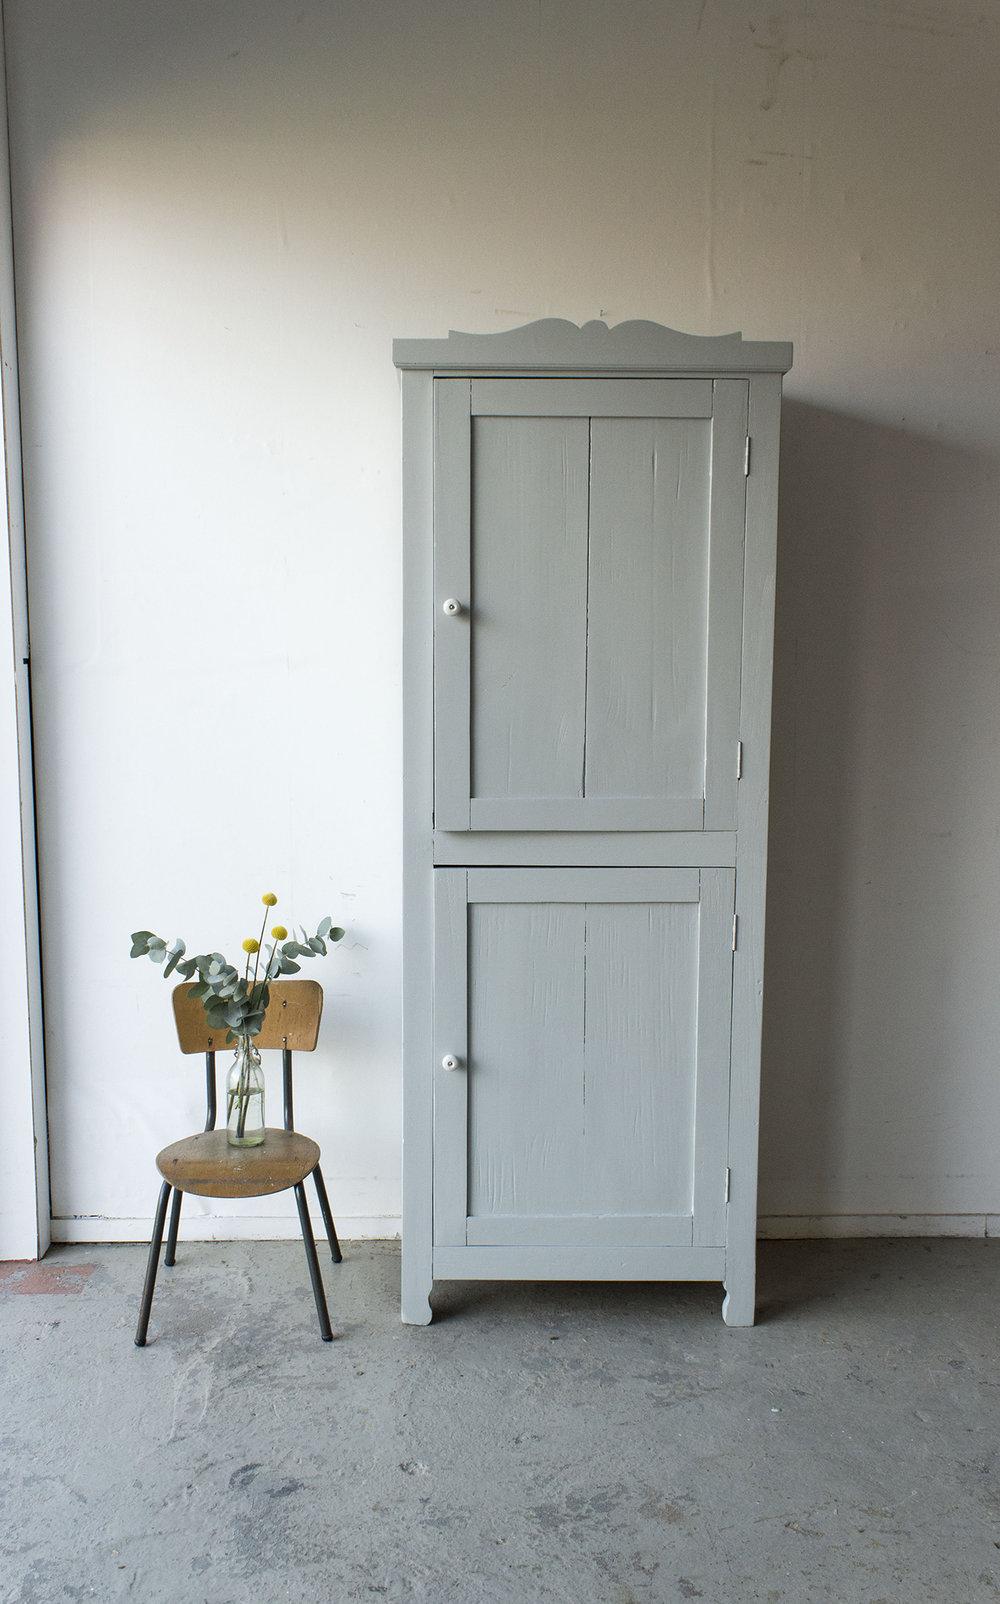 1399 - zachtgrijs vintage kledingkastje - Firma Zoethout_5.jpg